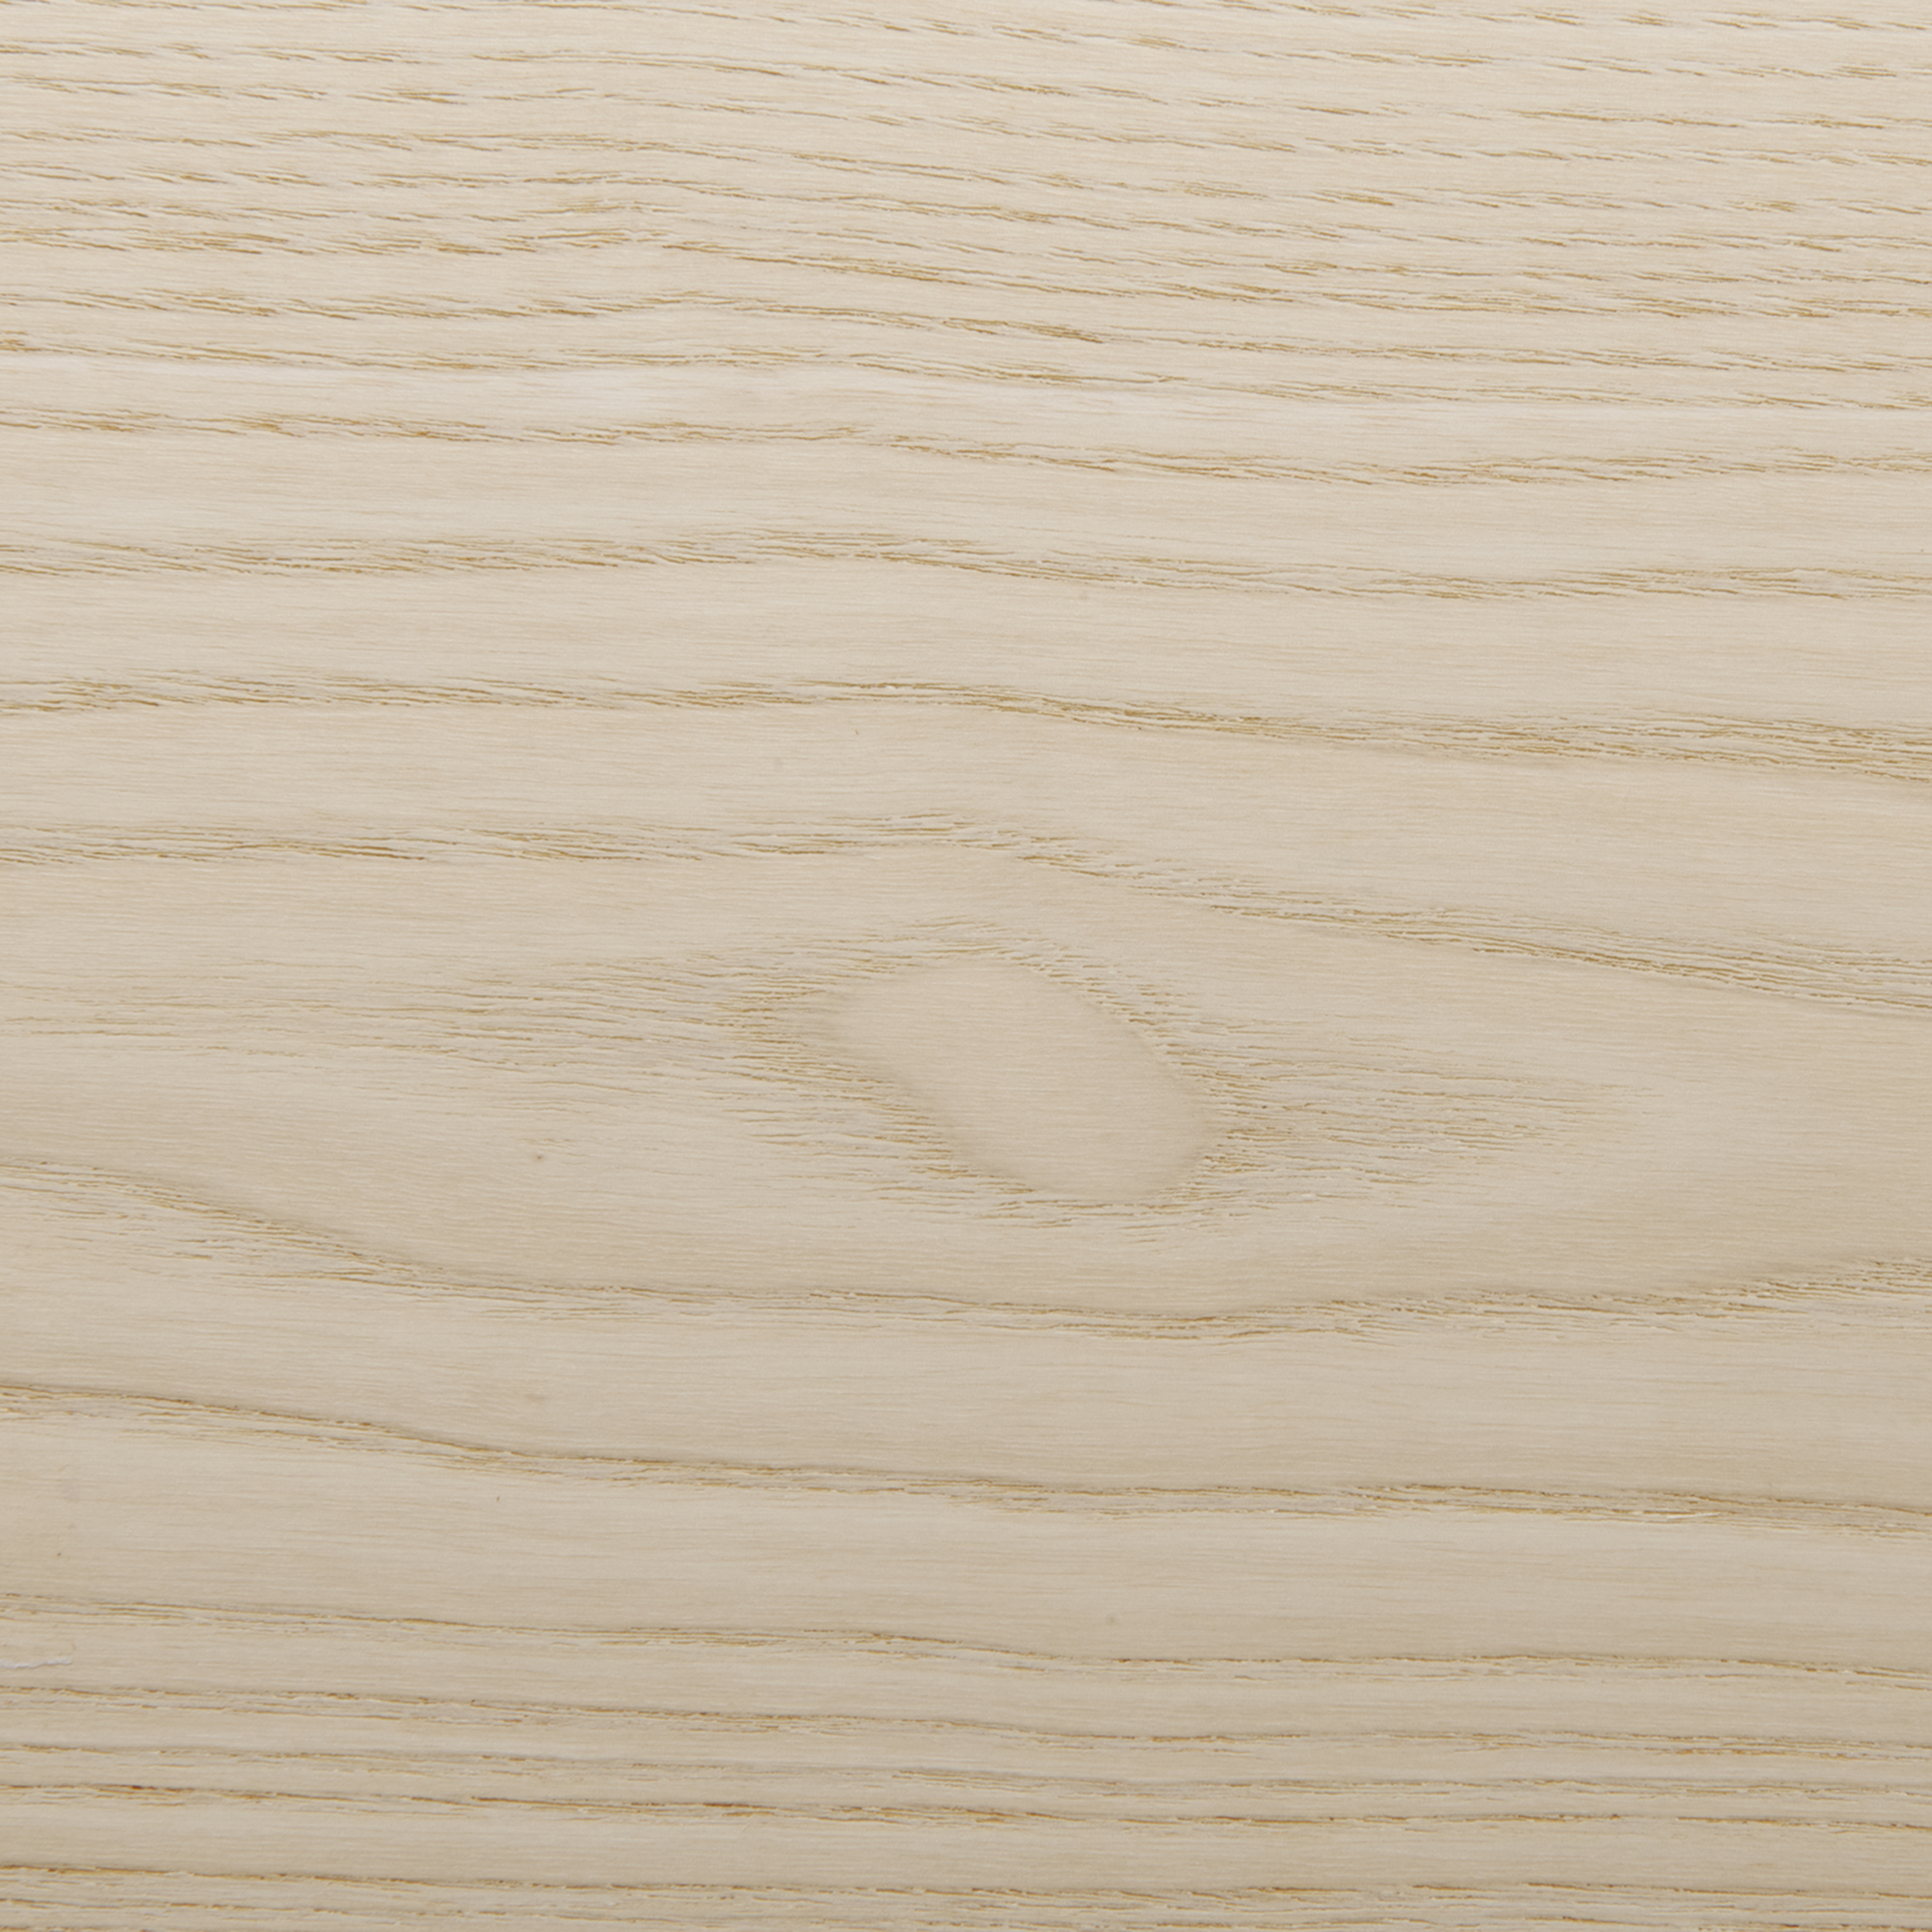 Ash Veneer Sheet Plain Sliced 4' x 8' 2-Ply Wood on Wood